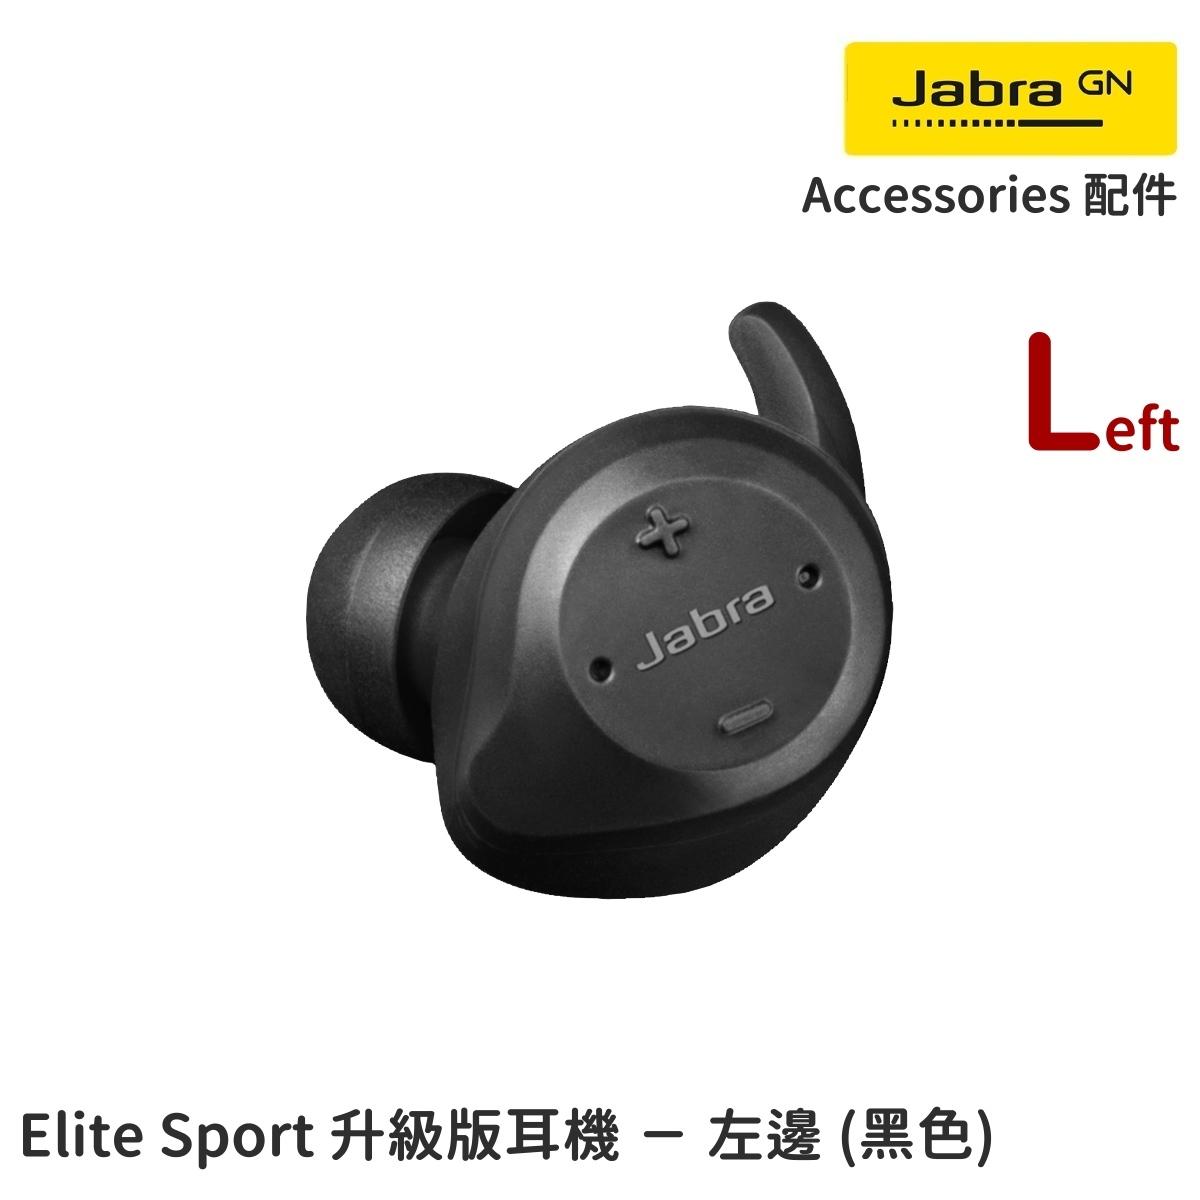 Elite Sport 升級版耳機-左邊 (黑色) 【香港行貨】